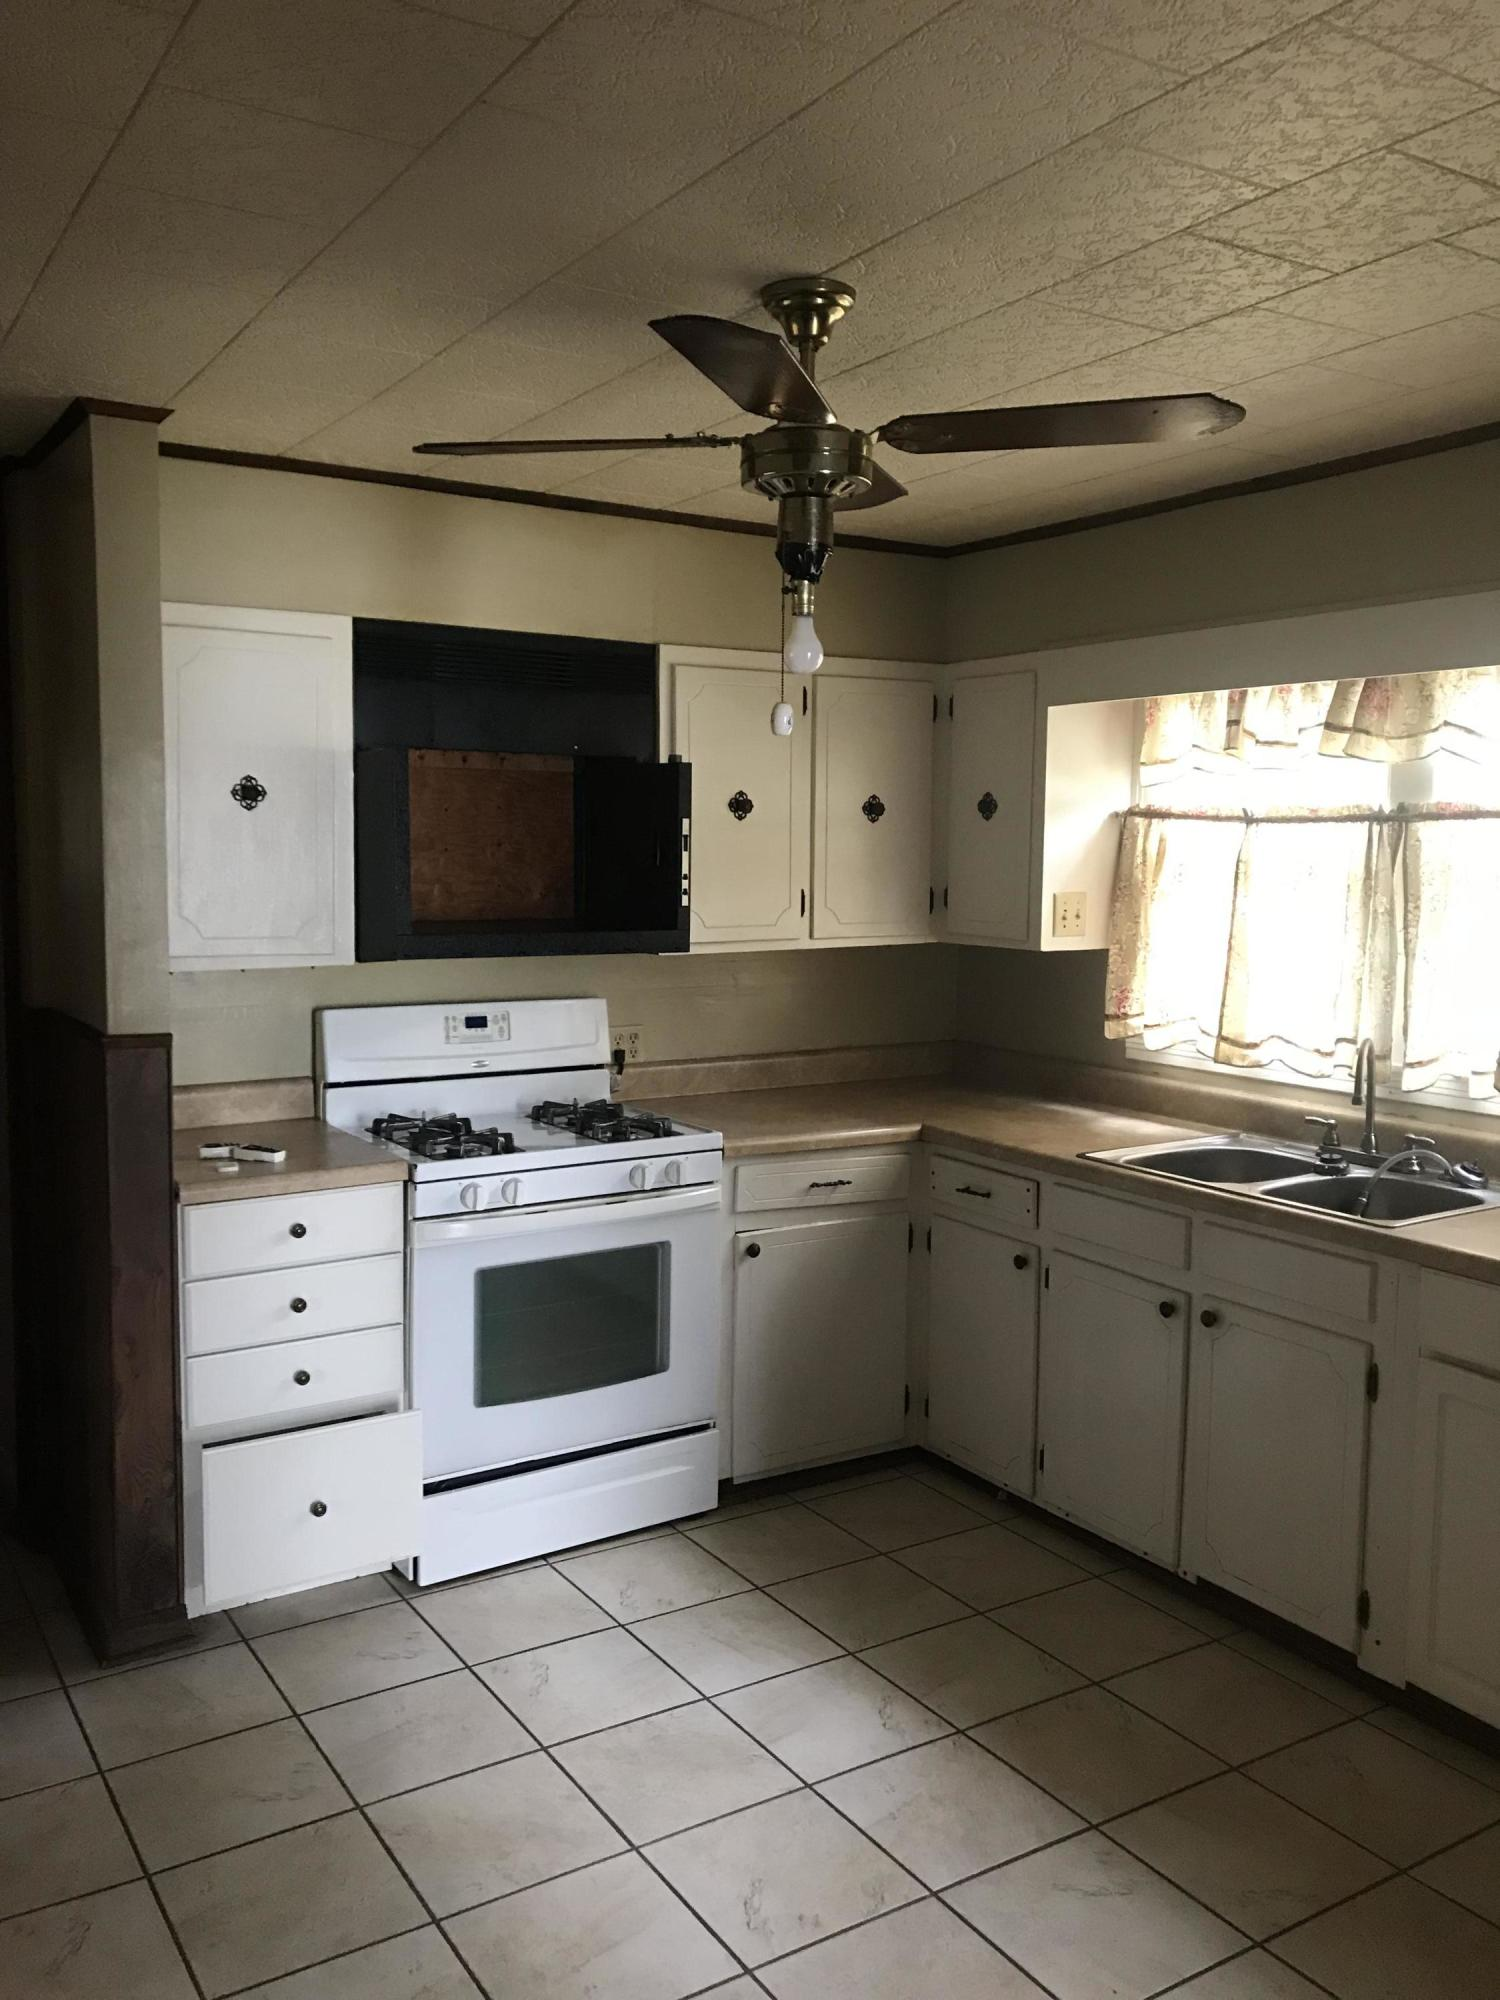 DeRidder home for sale, 129 Country Club Cir, DeRidder LA - $54,900